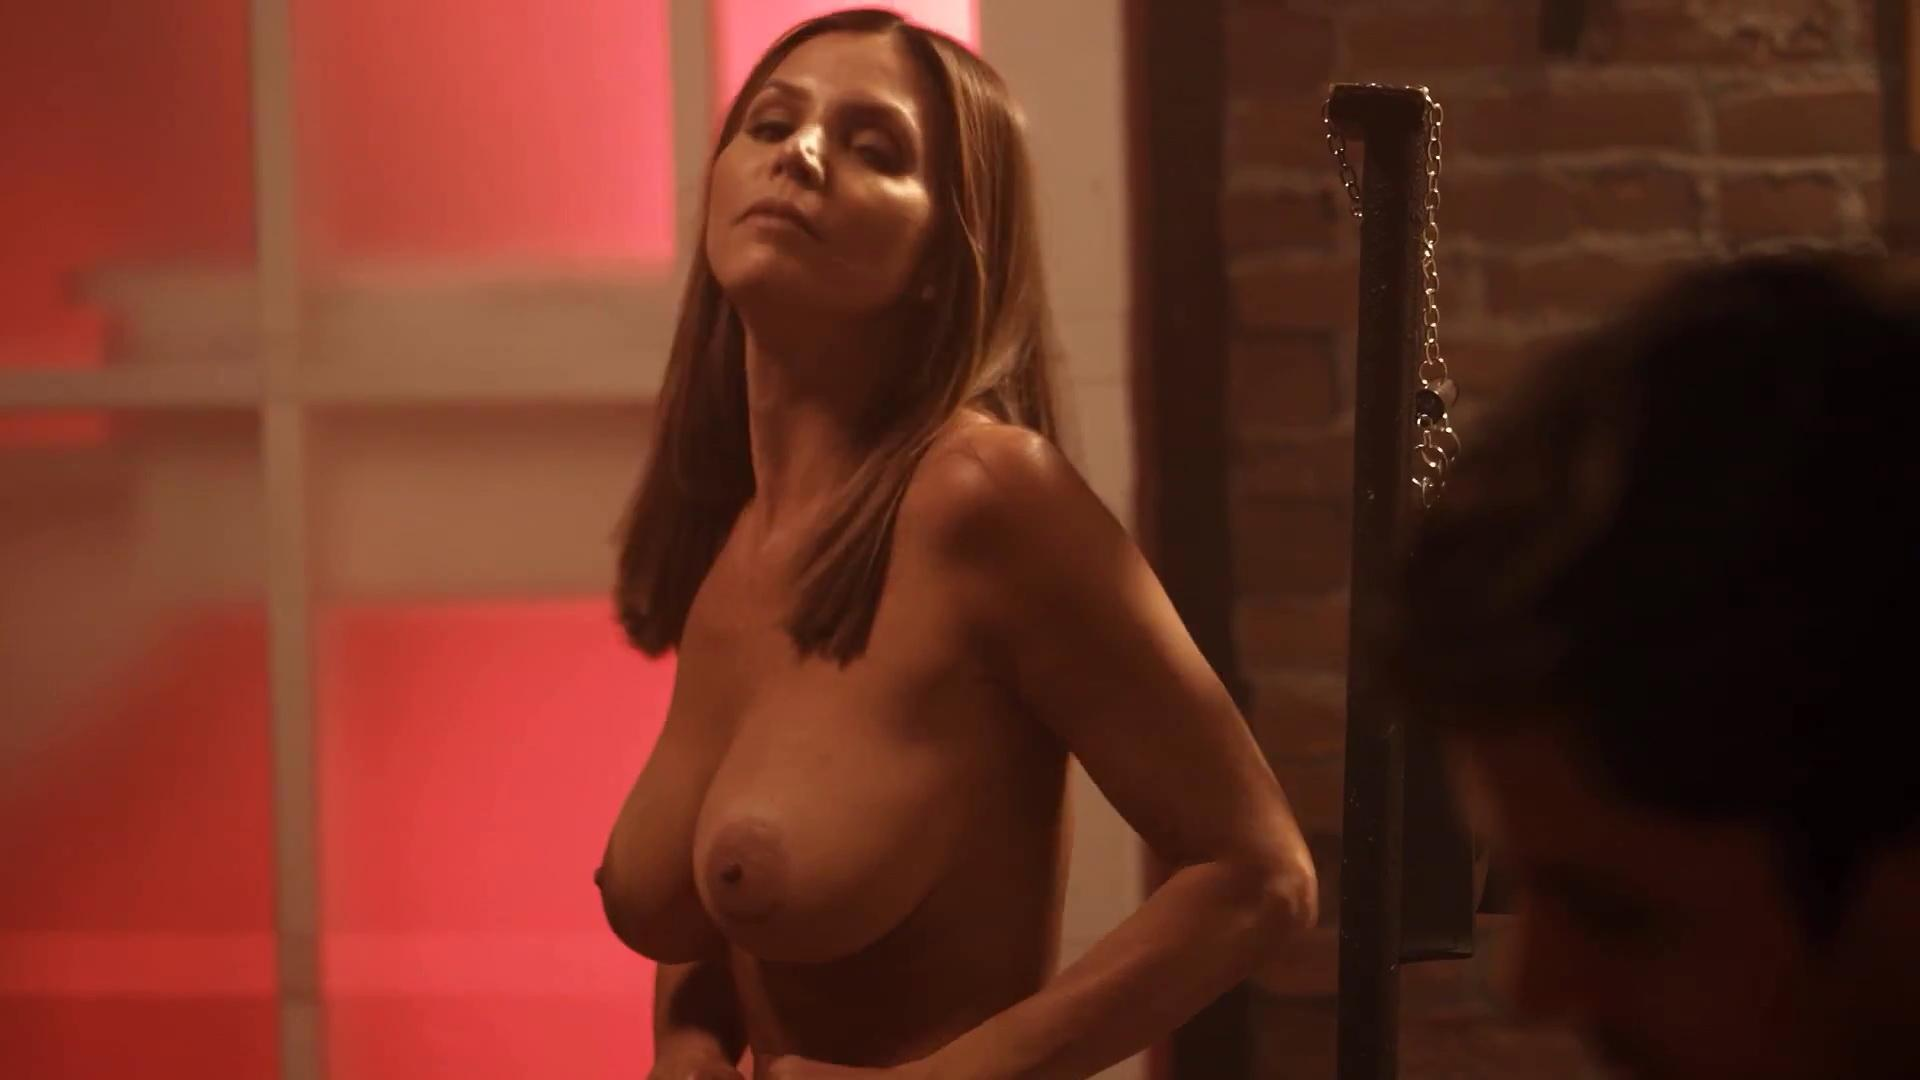 charisma carpenter nude movie